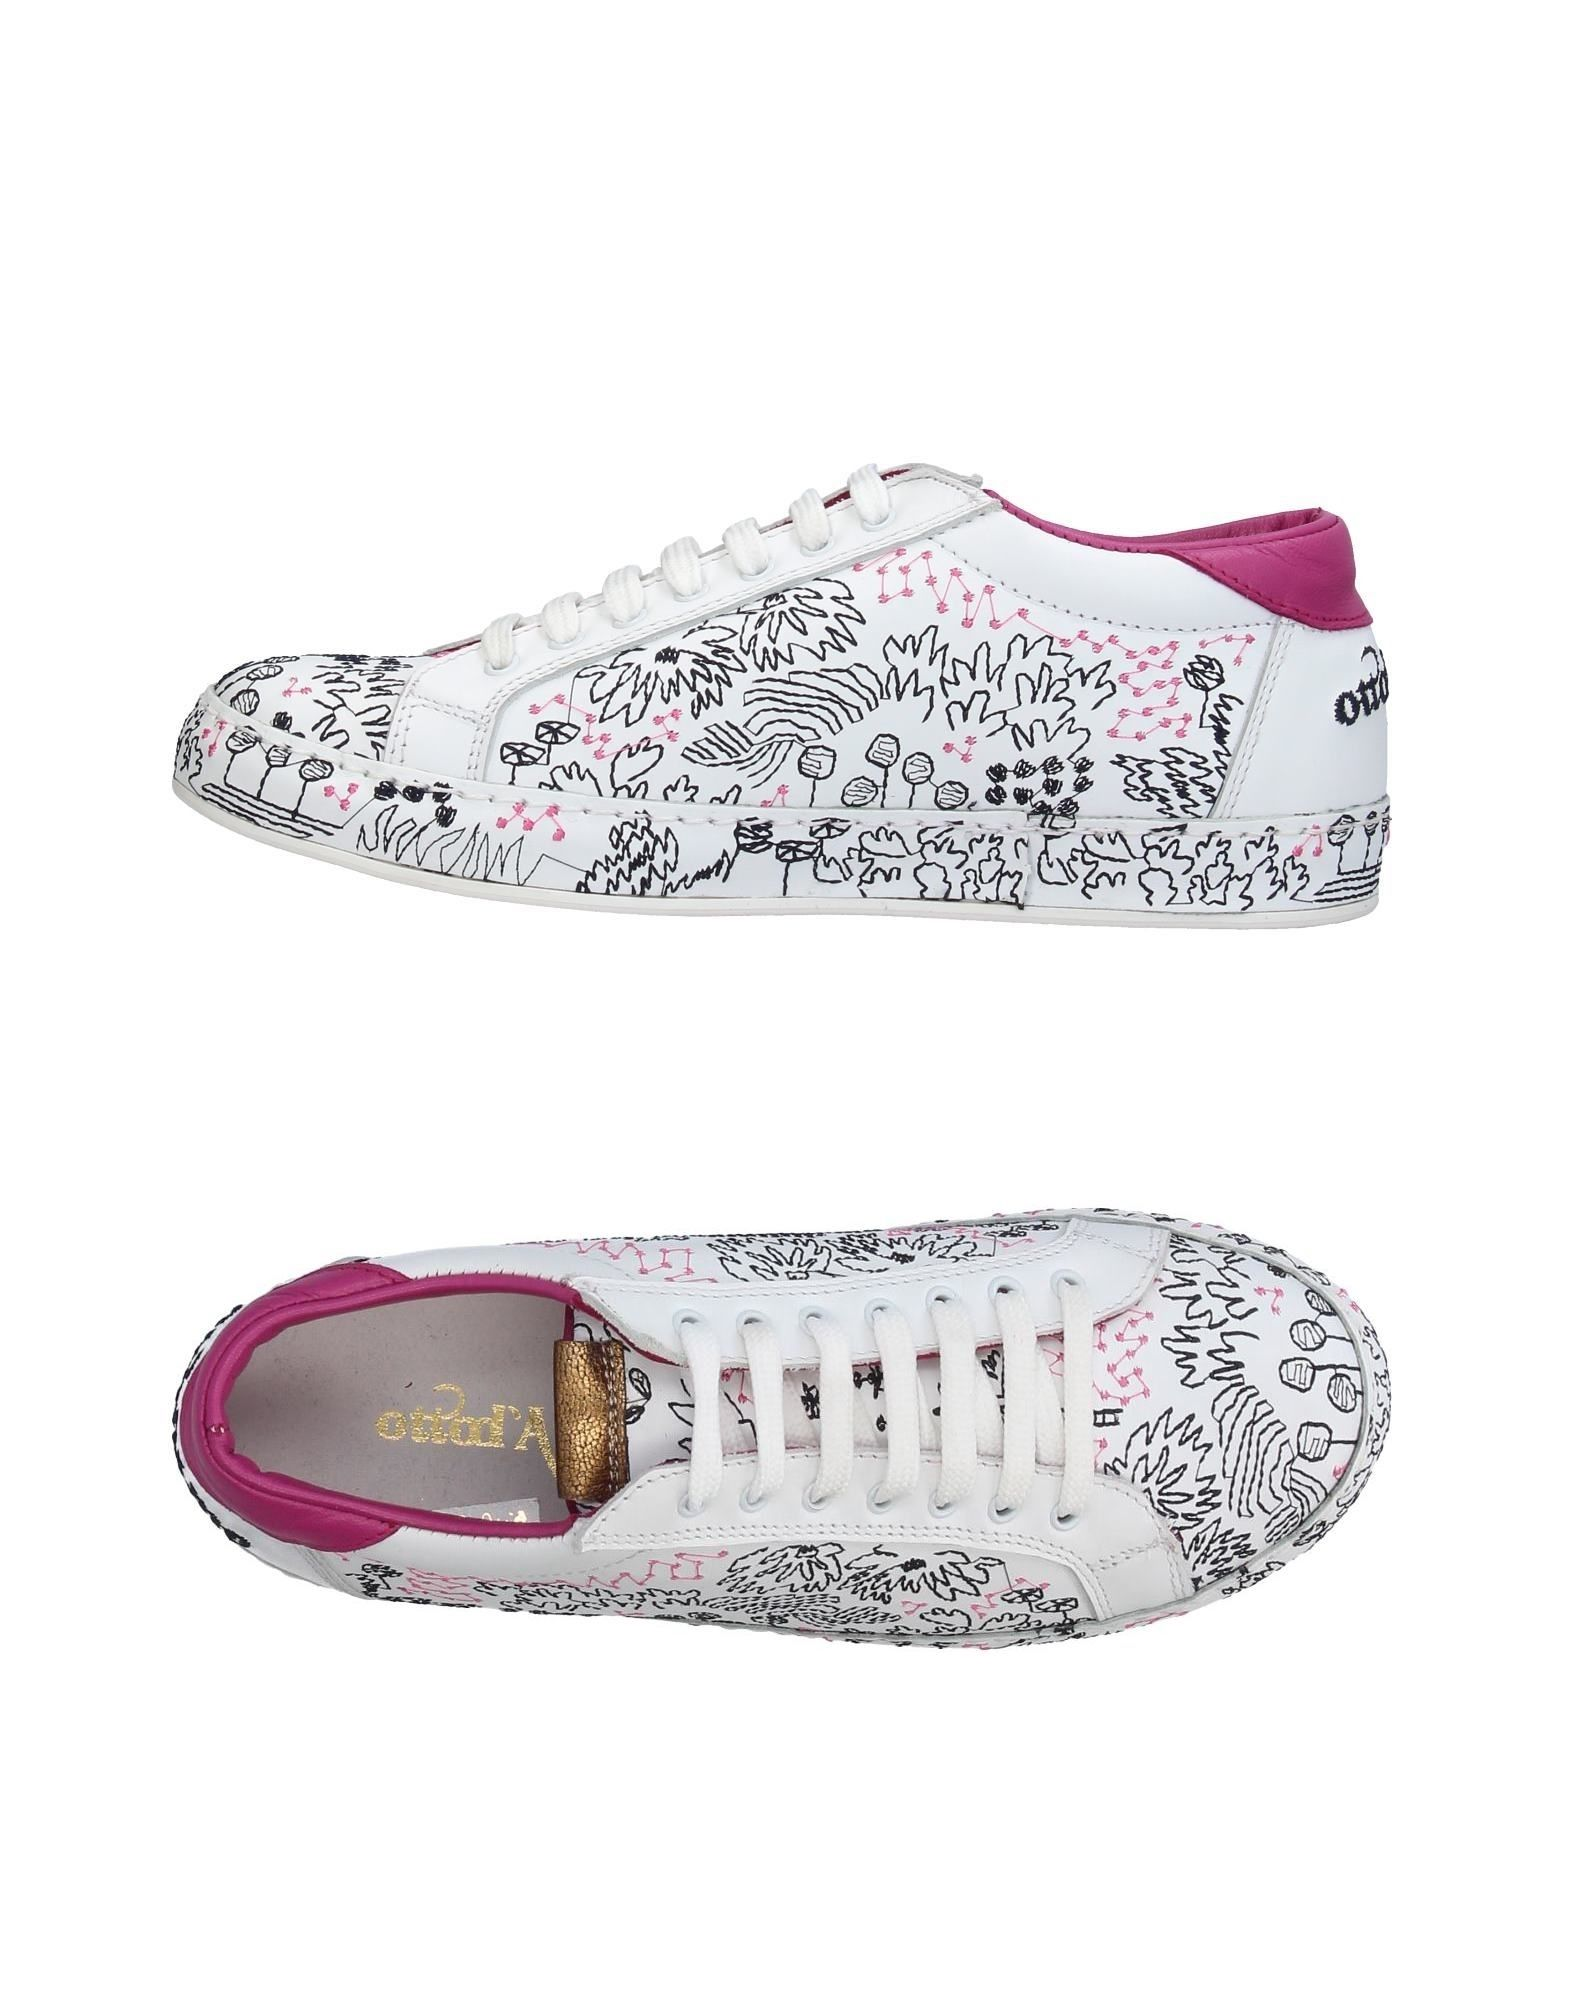 OTTOD´AME Damen Low Sneakers & Tennisschuhe Farbe Weiß Größe 7 jetztbilligerkaufen